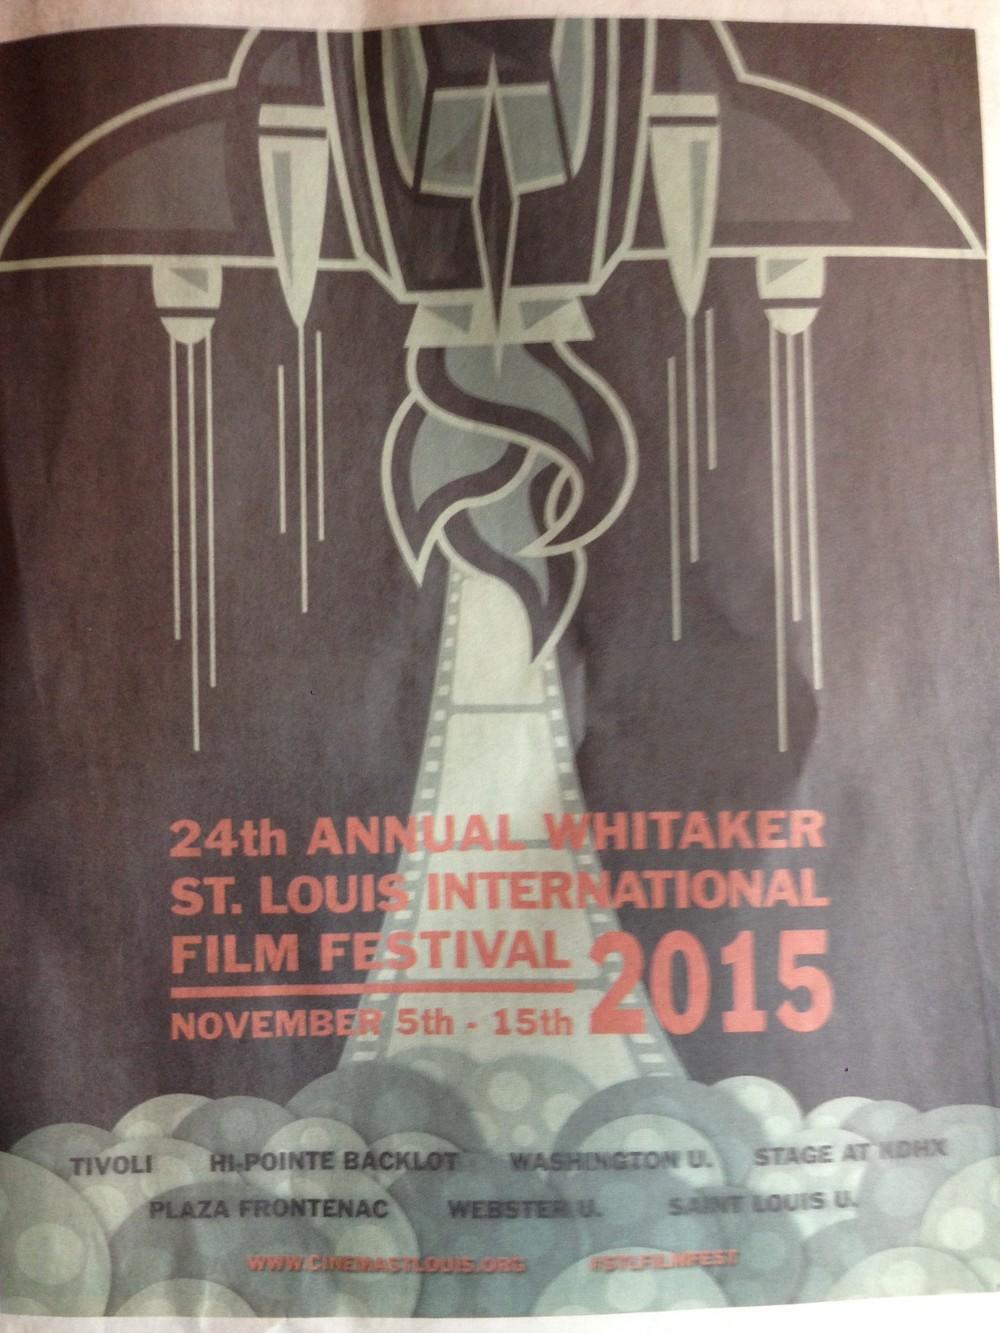 A fantastic film festival!